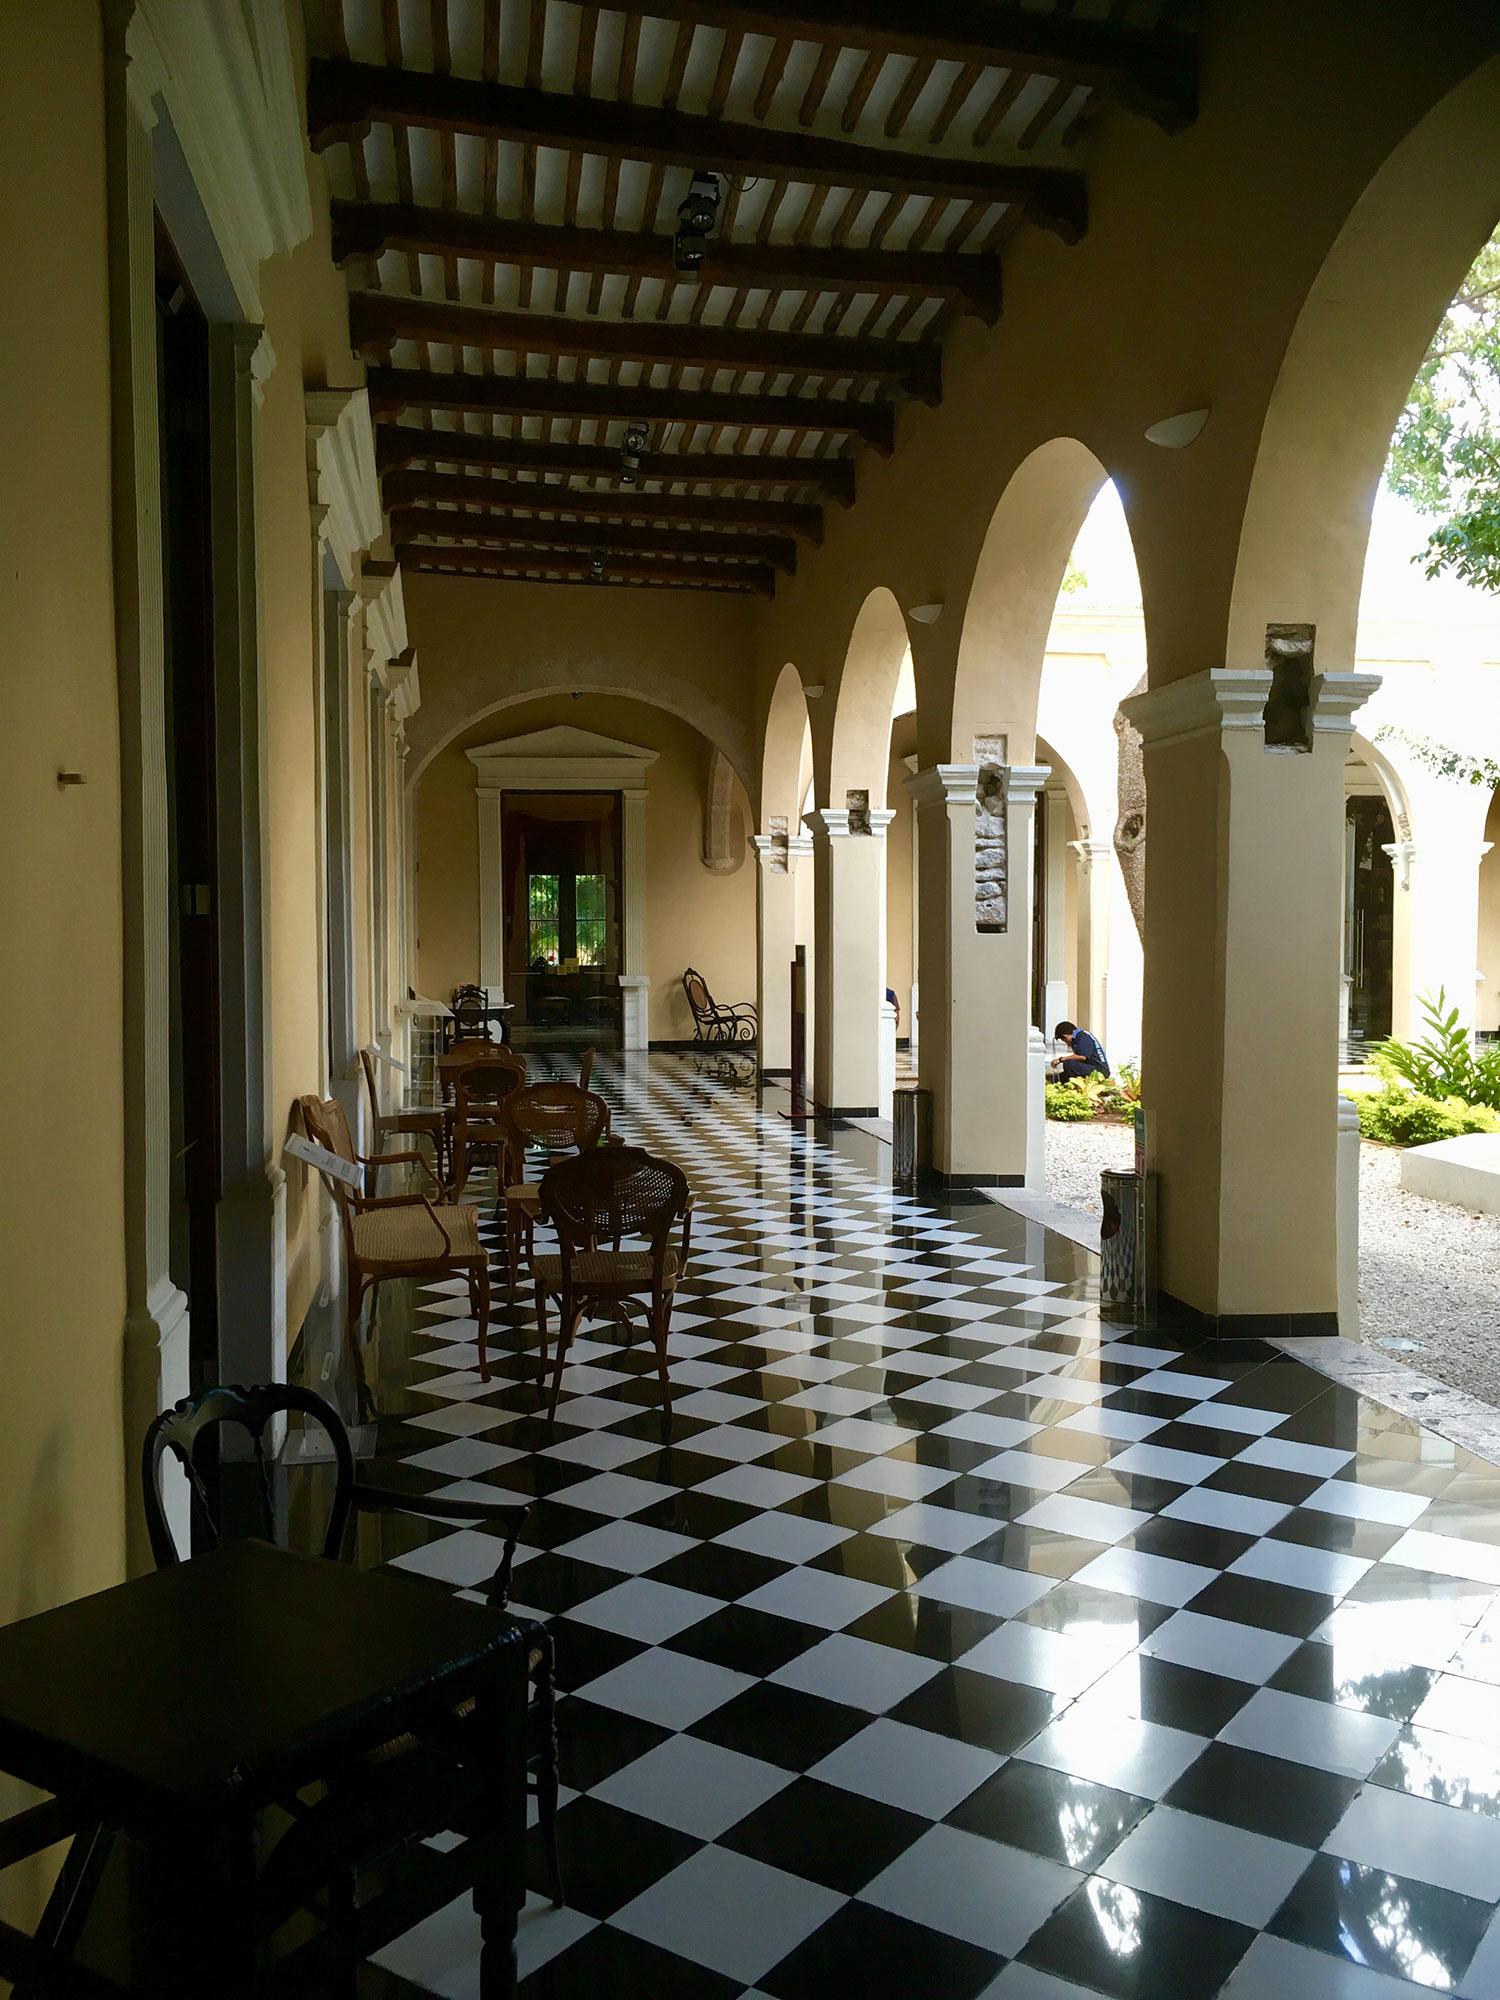 Hammocks_and_Ruins_Blog_Riviera_Maya_Mexico_Travel_Discover_Yucatan_What_to_do_Museums_Casa_Montejo_31.jpg